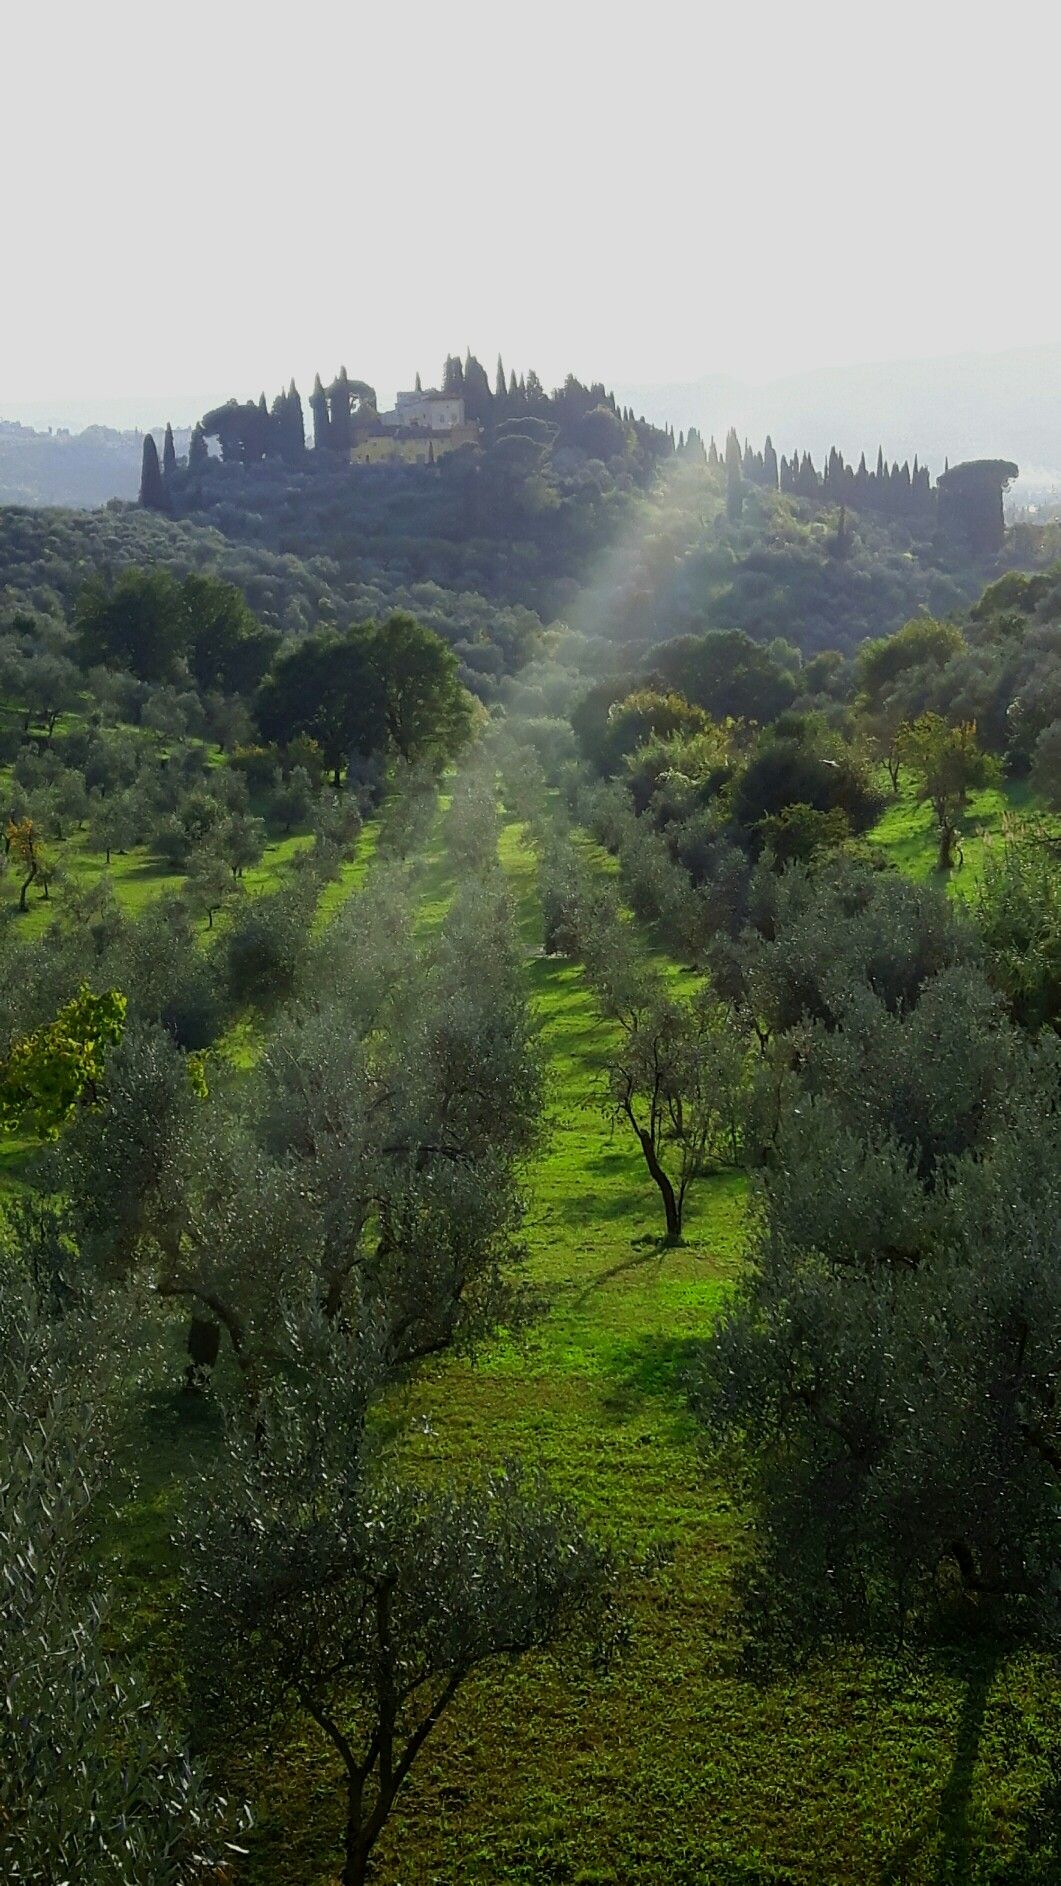 Le bellissime colline intorno a Firenze!